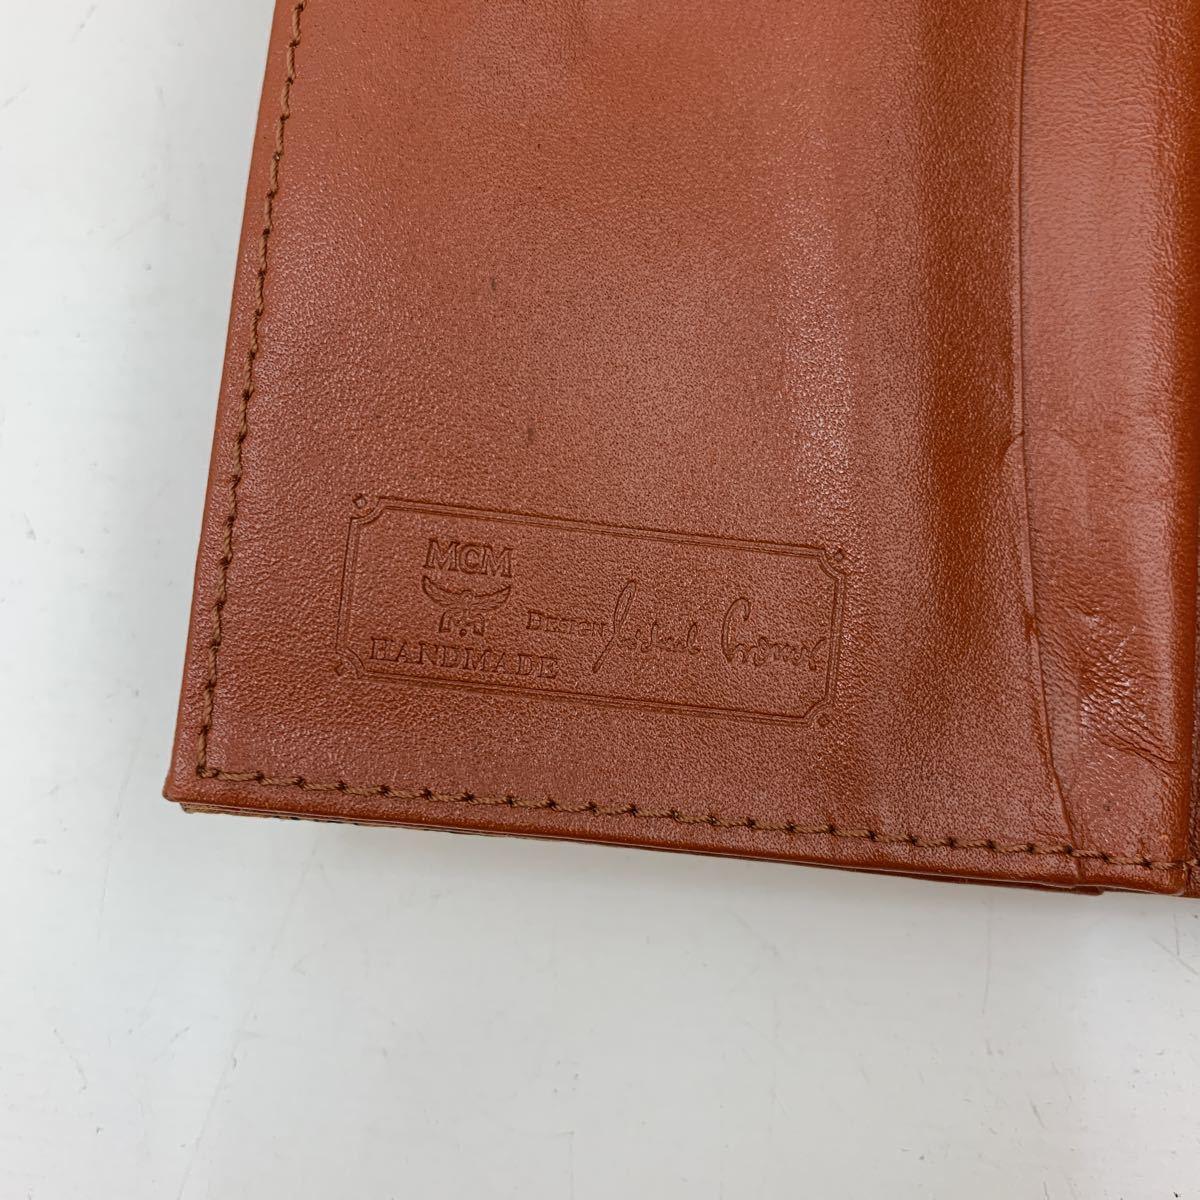 buy online 69713 c19e6 代購代標第一品牌- 樂淘letao - □正規MCM エムシーエム総柄ロゴ ...